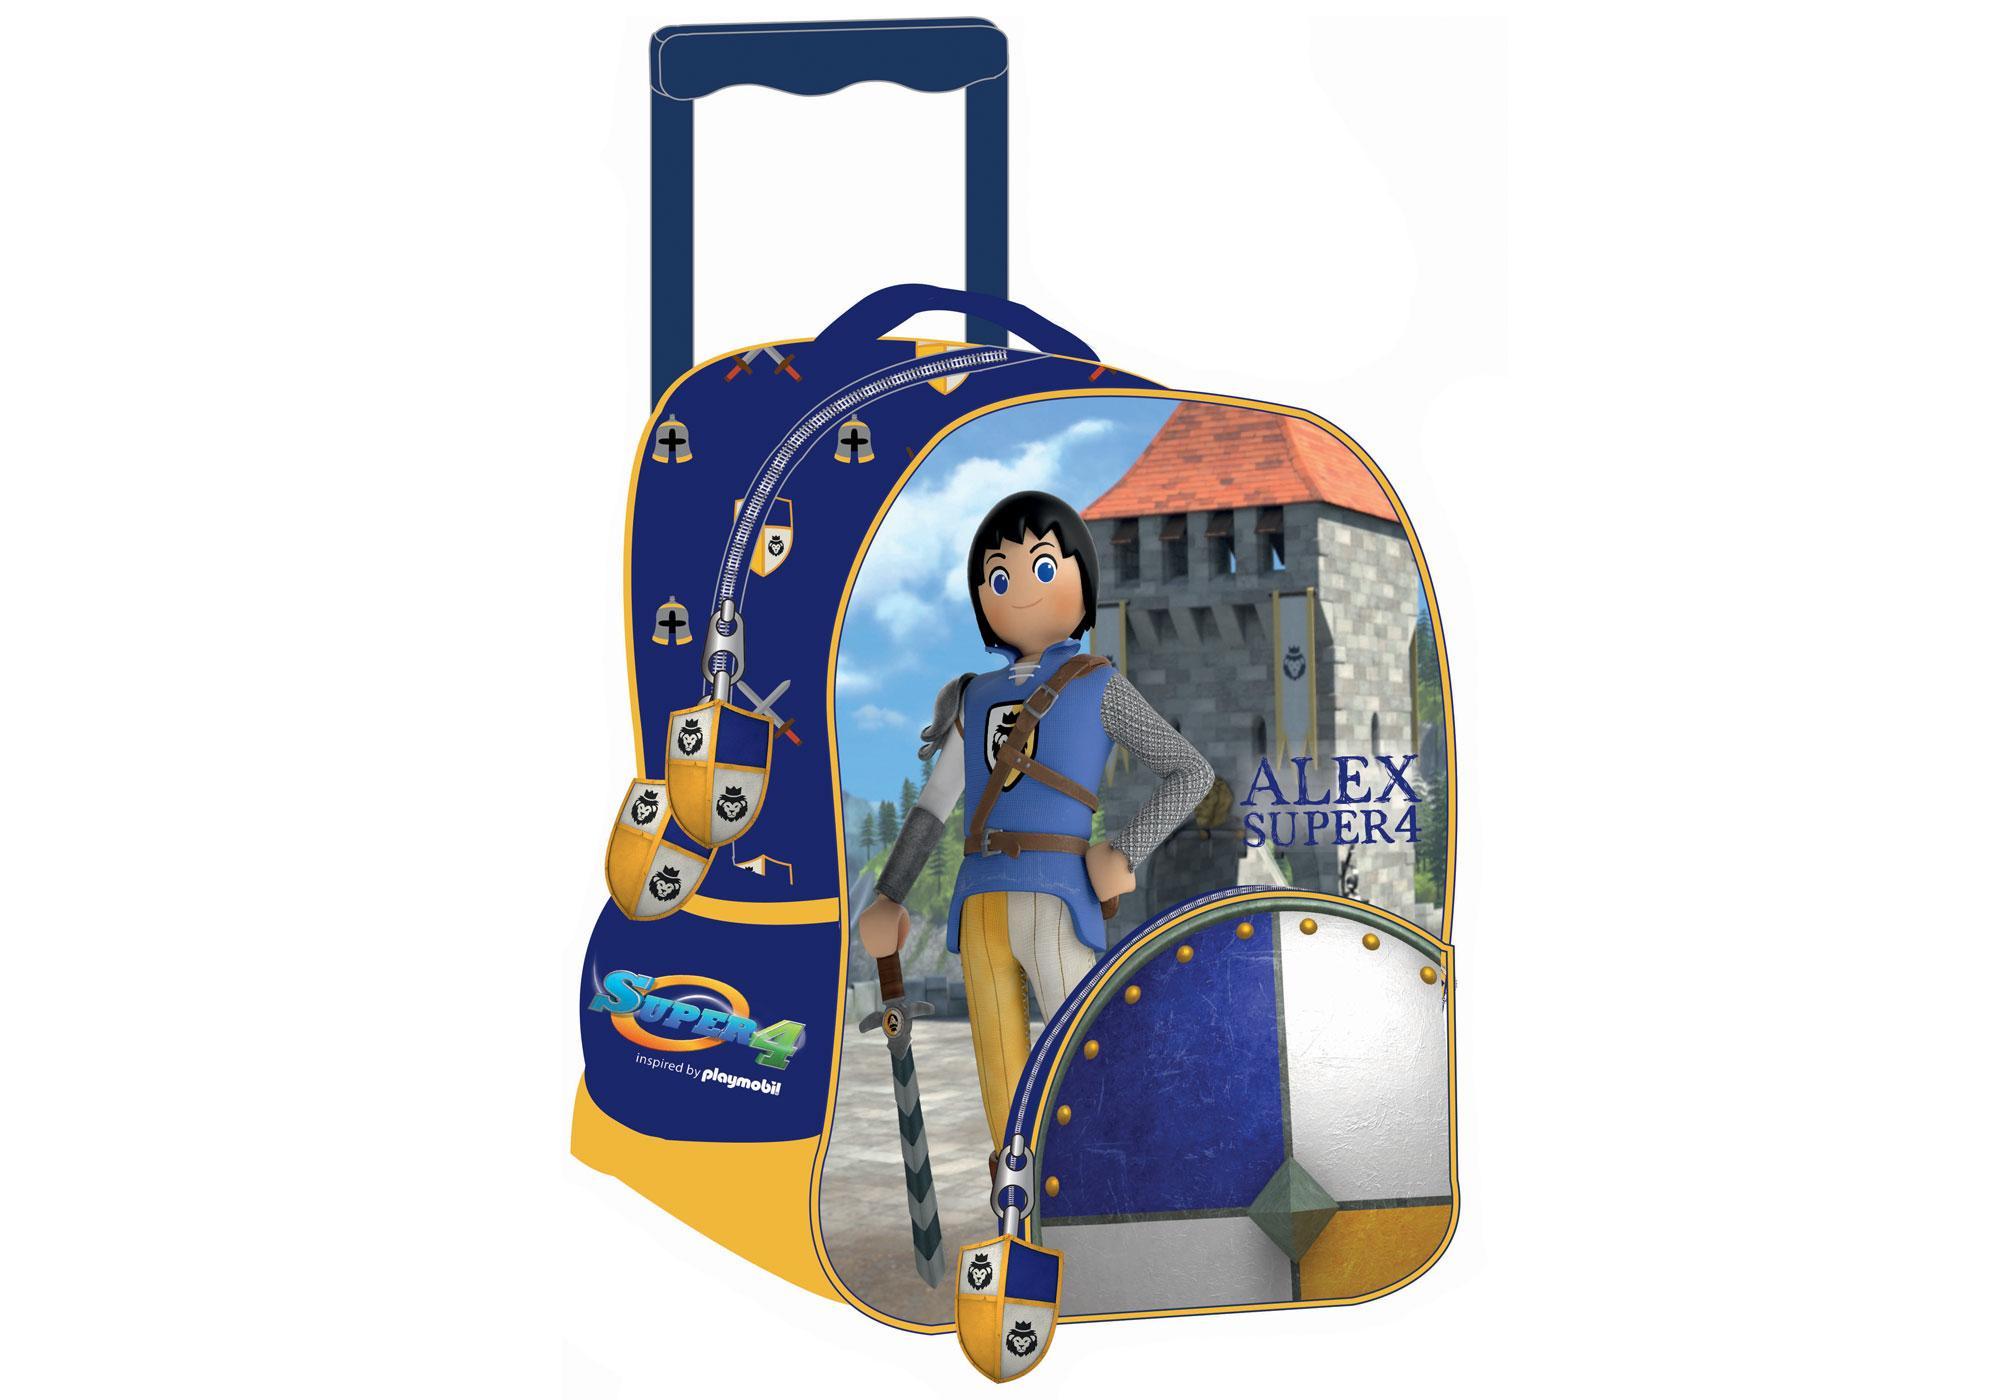 80070_product_detail/Kinder-Trolley - Super 4 Alex